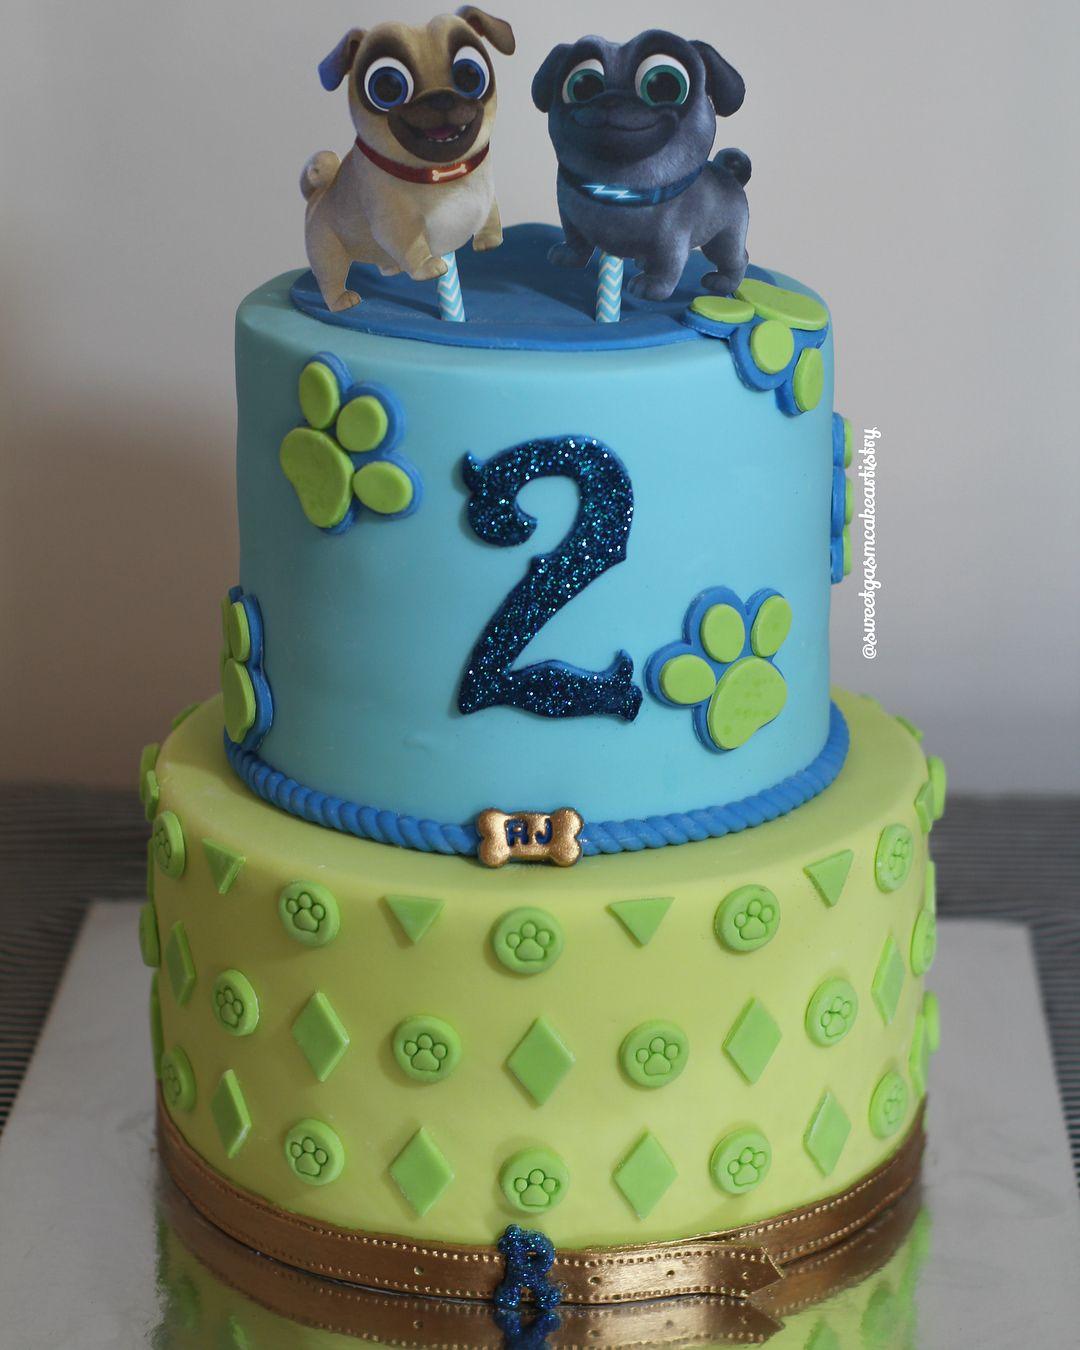 Groovy Nycbaker Nyc Baker Puppydogpalscake Puppy Birthday Parties Funny Birthday Cards Online Inifodamsfinfo